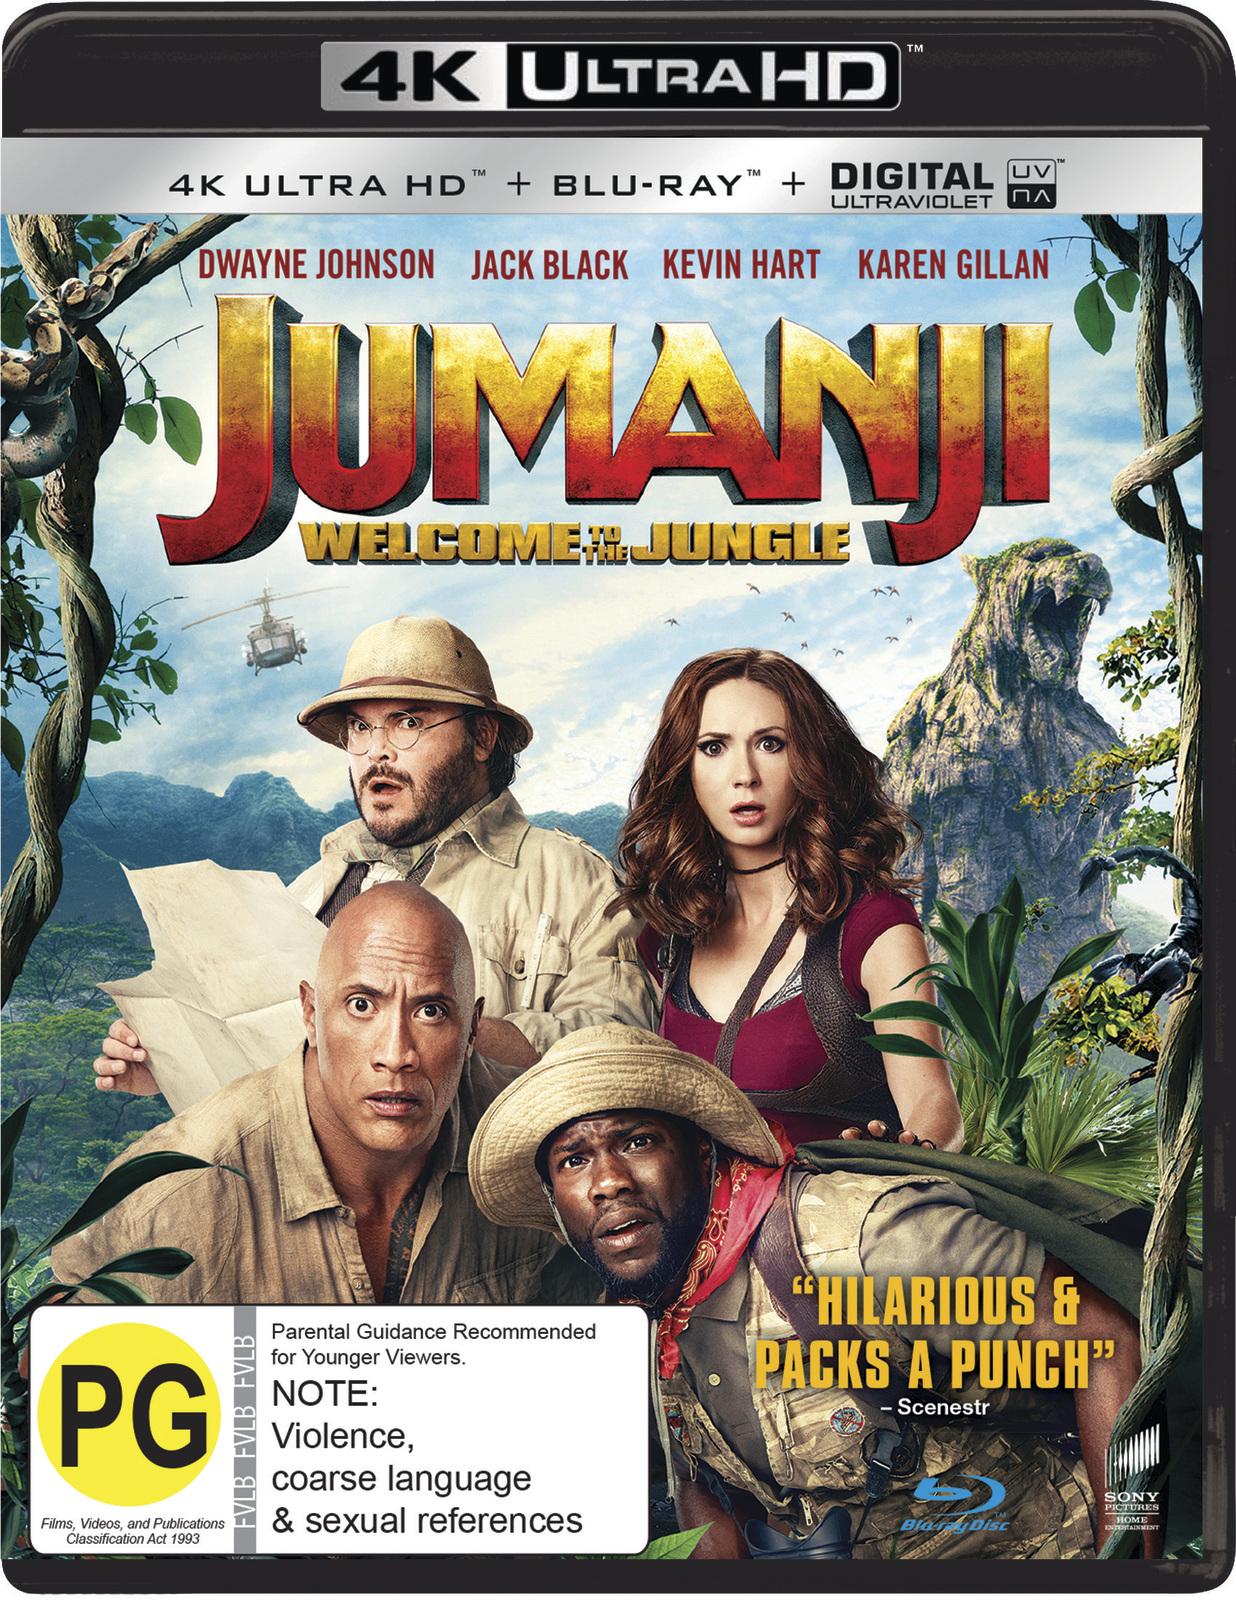 Jumanji: Welcome to the Jungle (4K UHD + Blu-ray) on UHD Blu-ray image